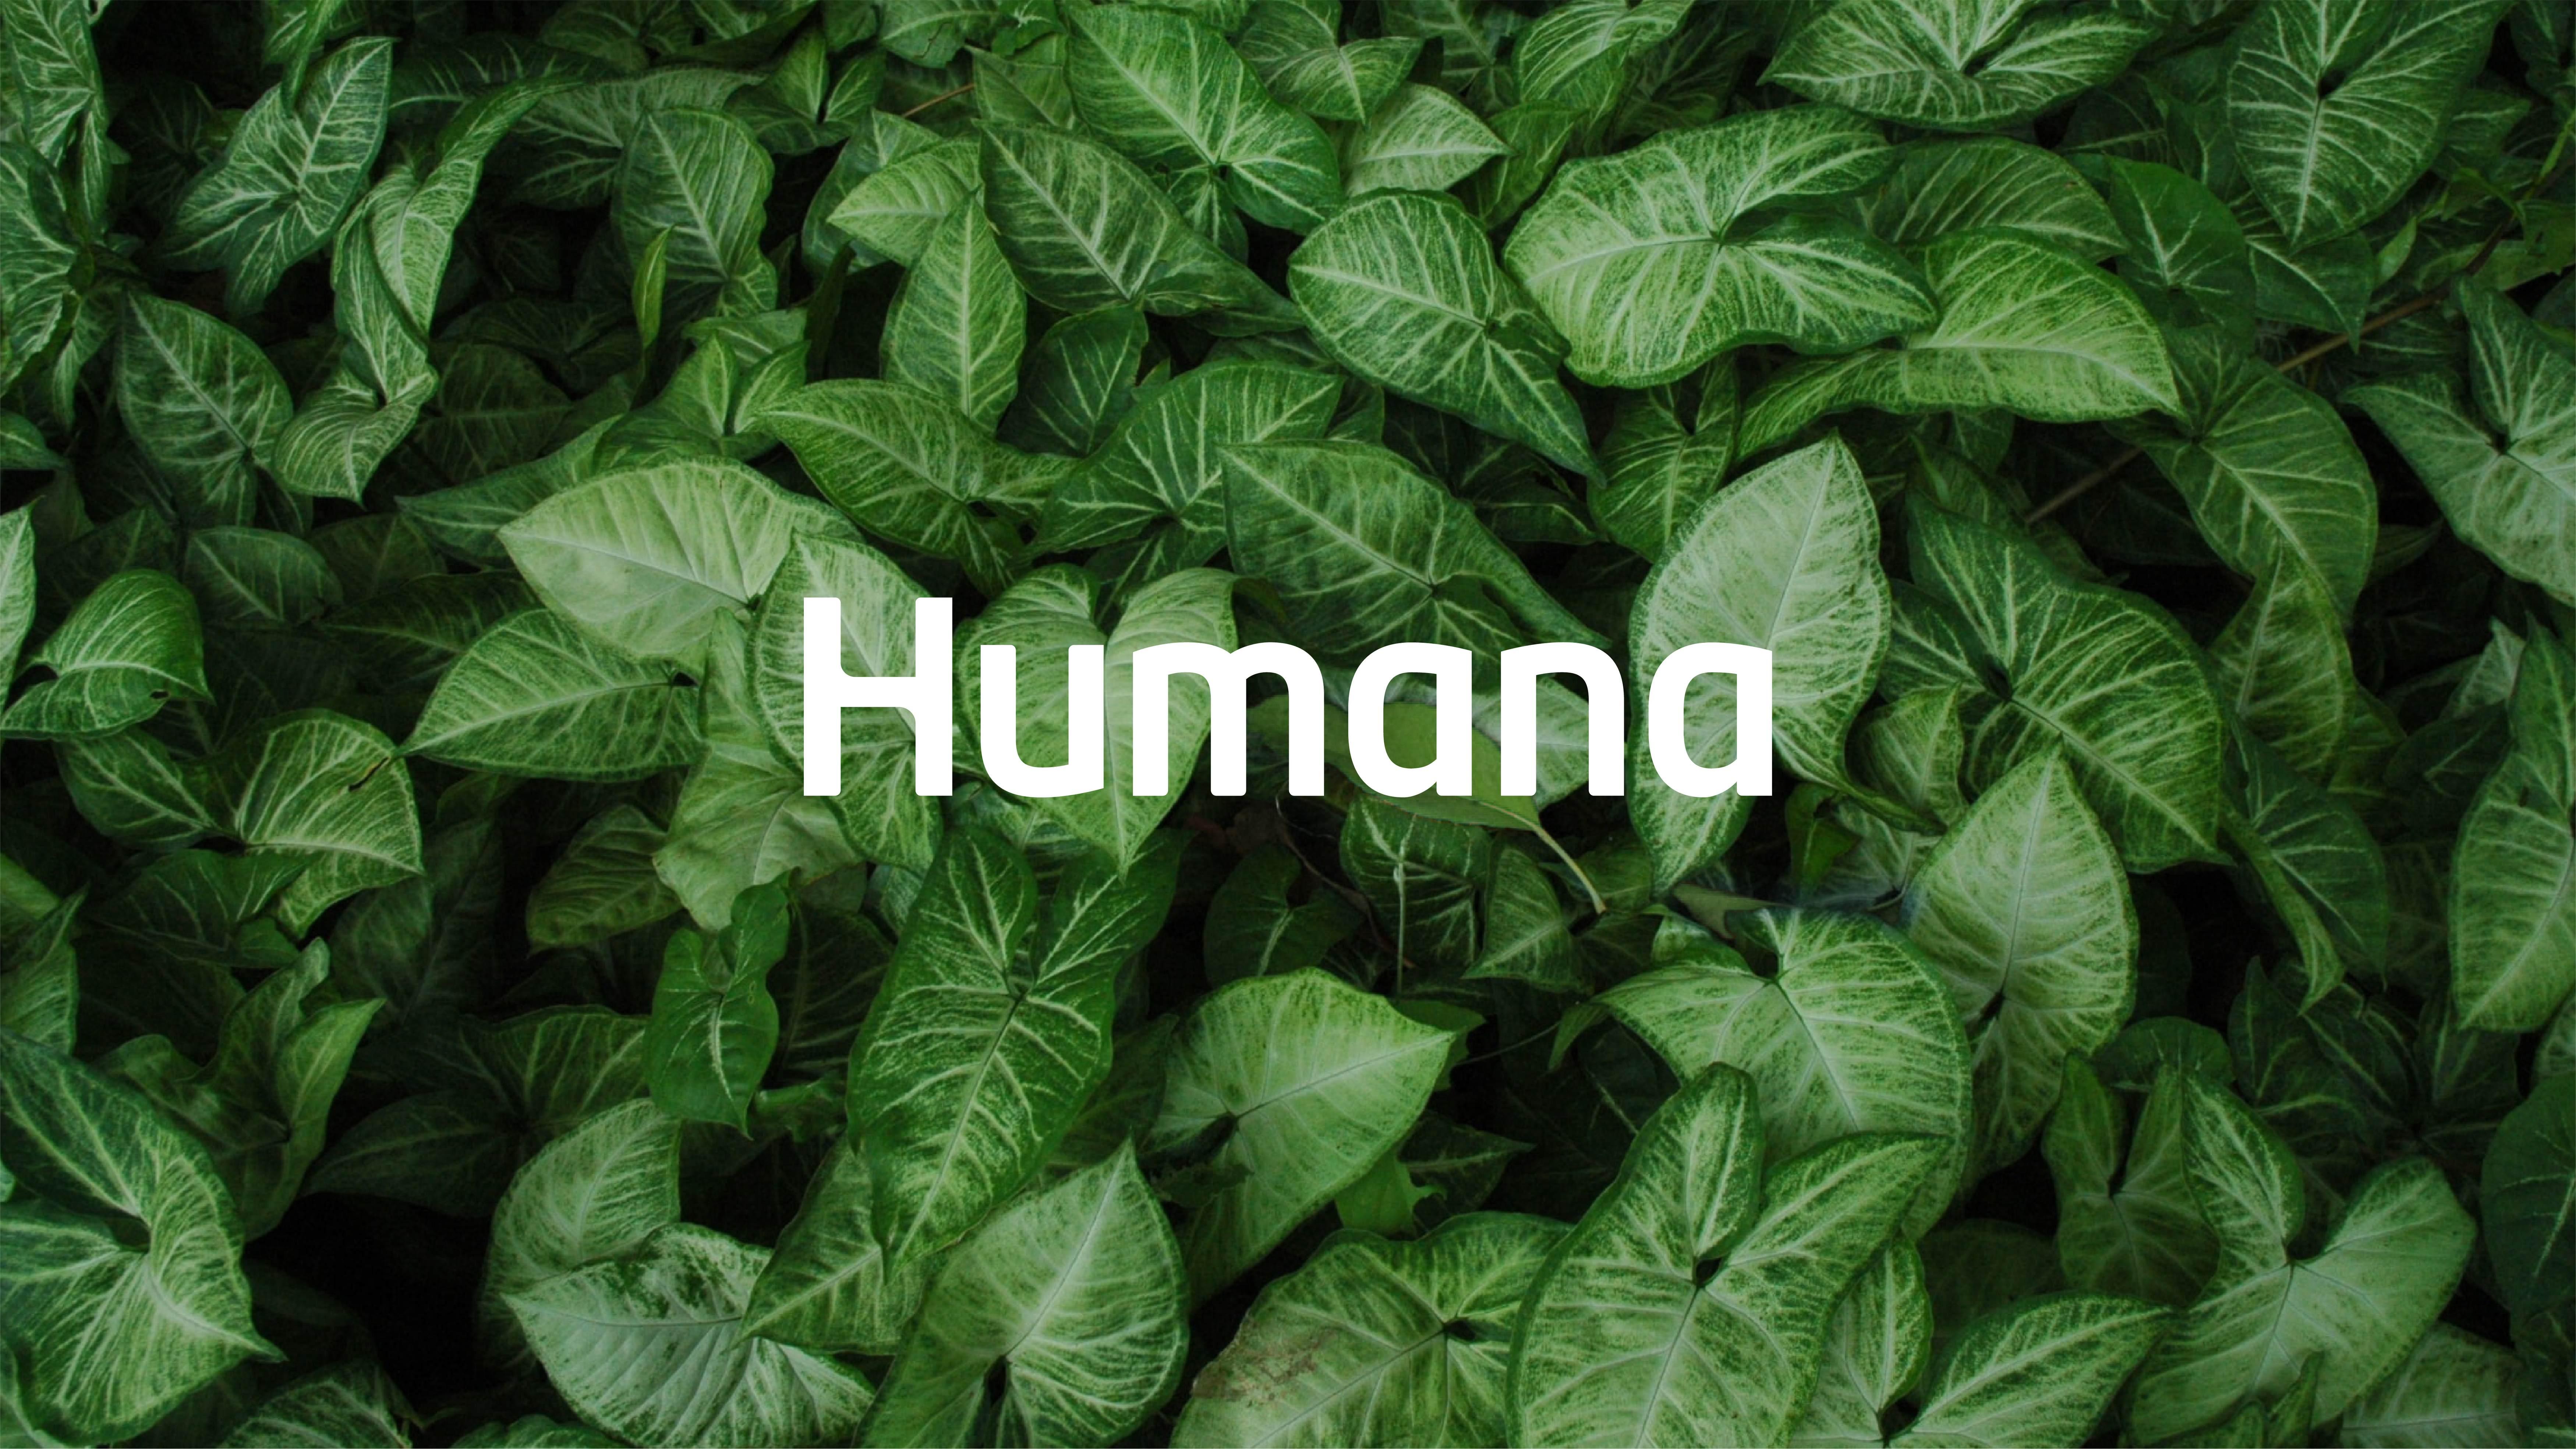 Humana.